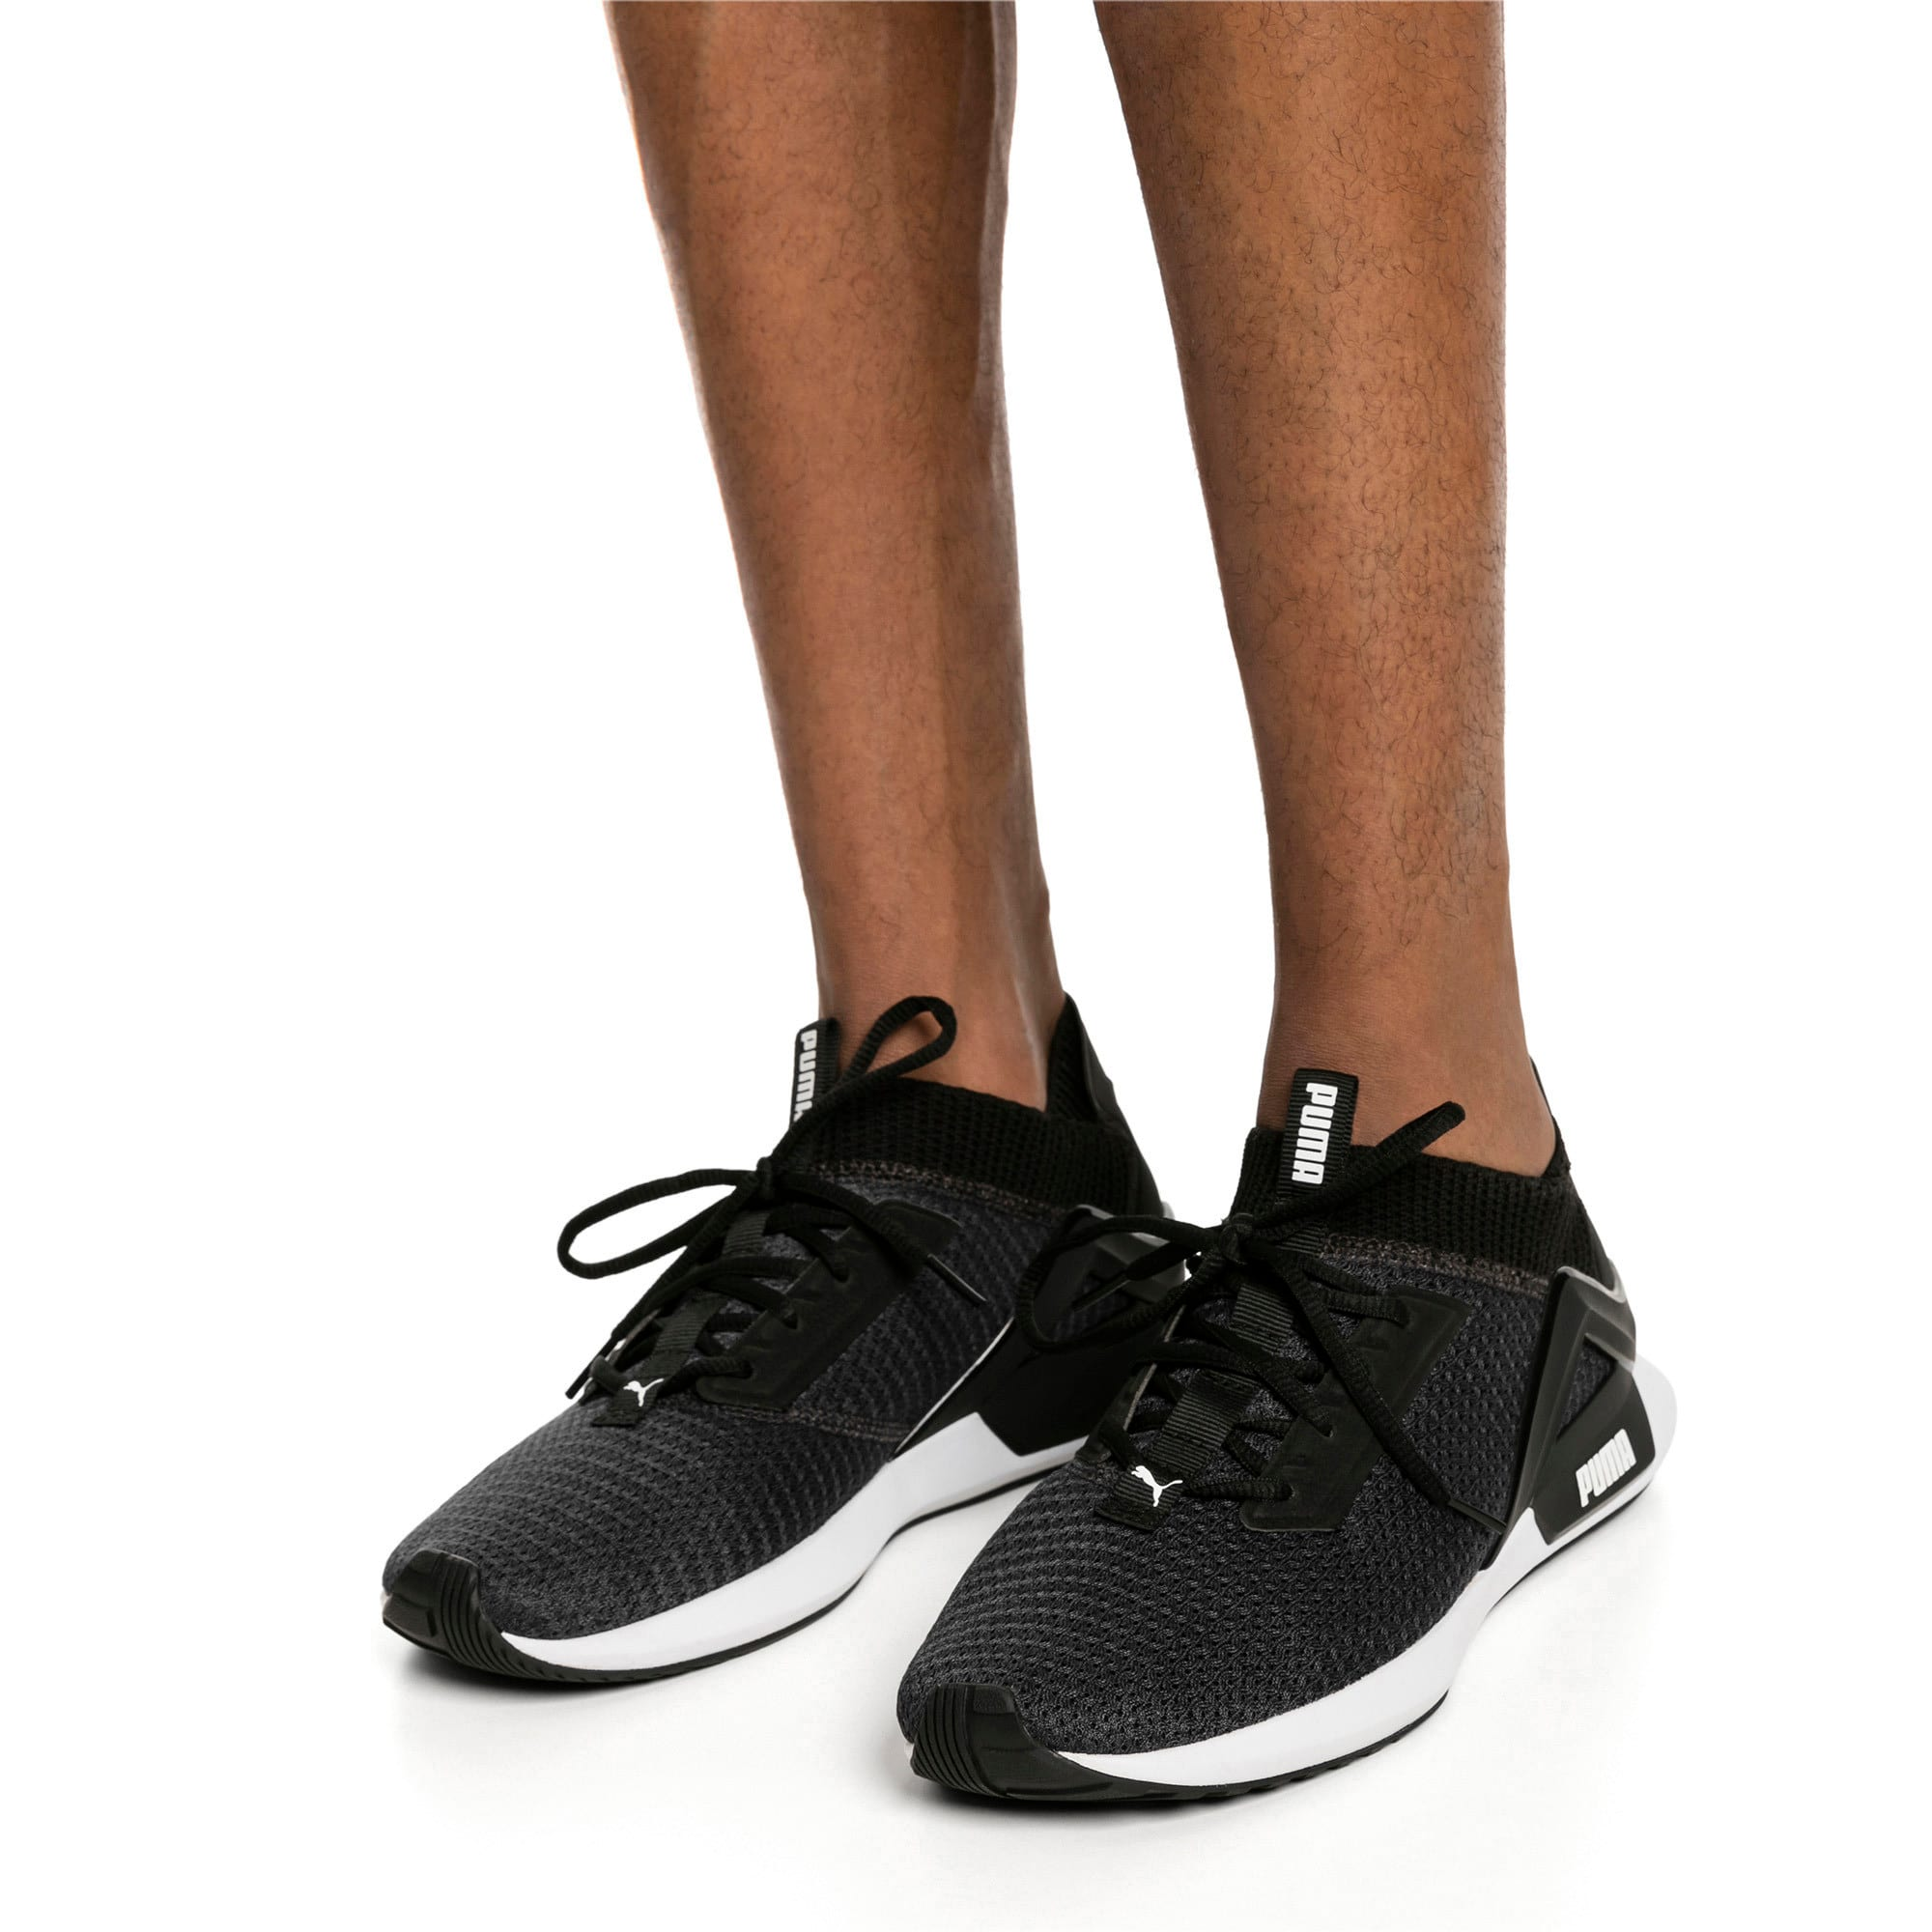 Thumbnail 7 of Rogue Men's Running Shoes, Puma Black, medium